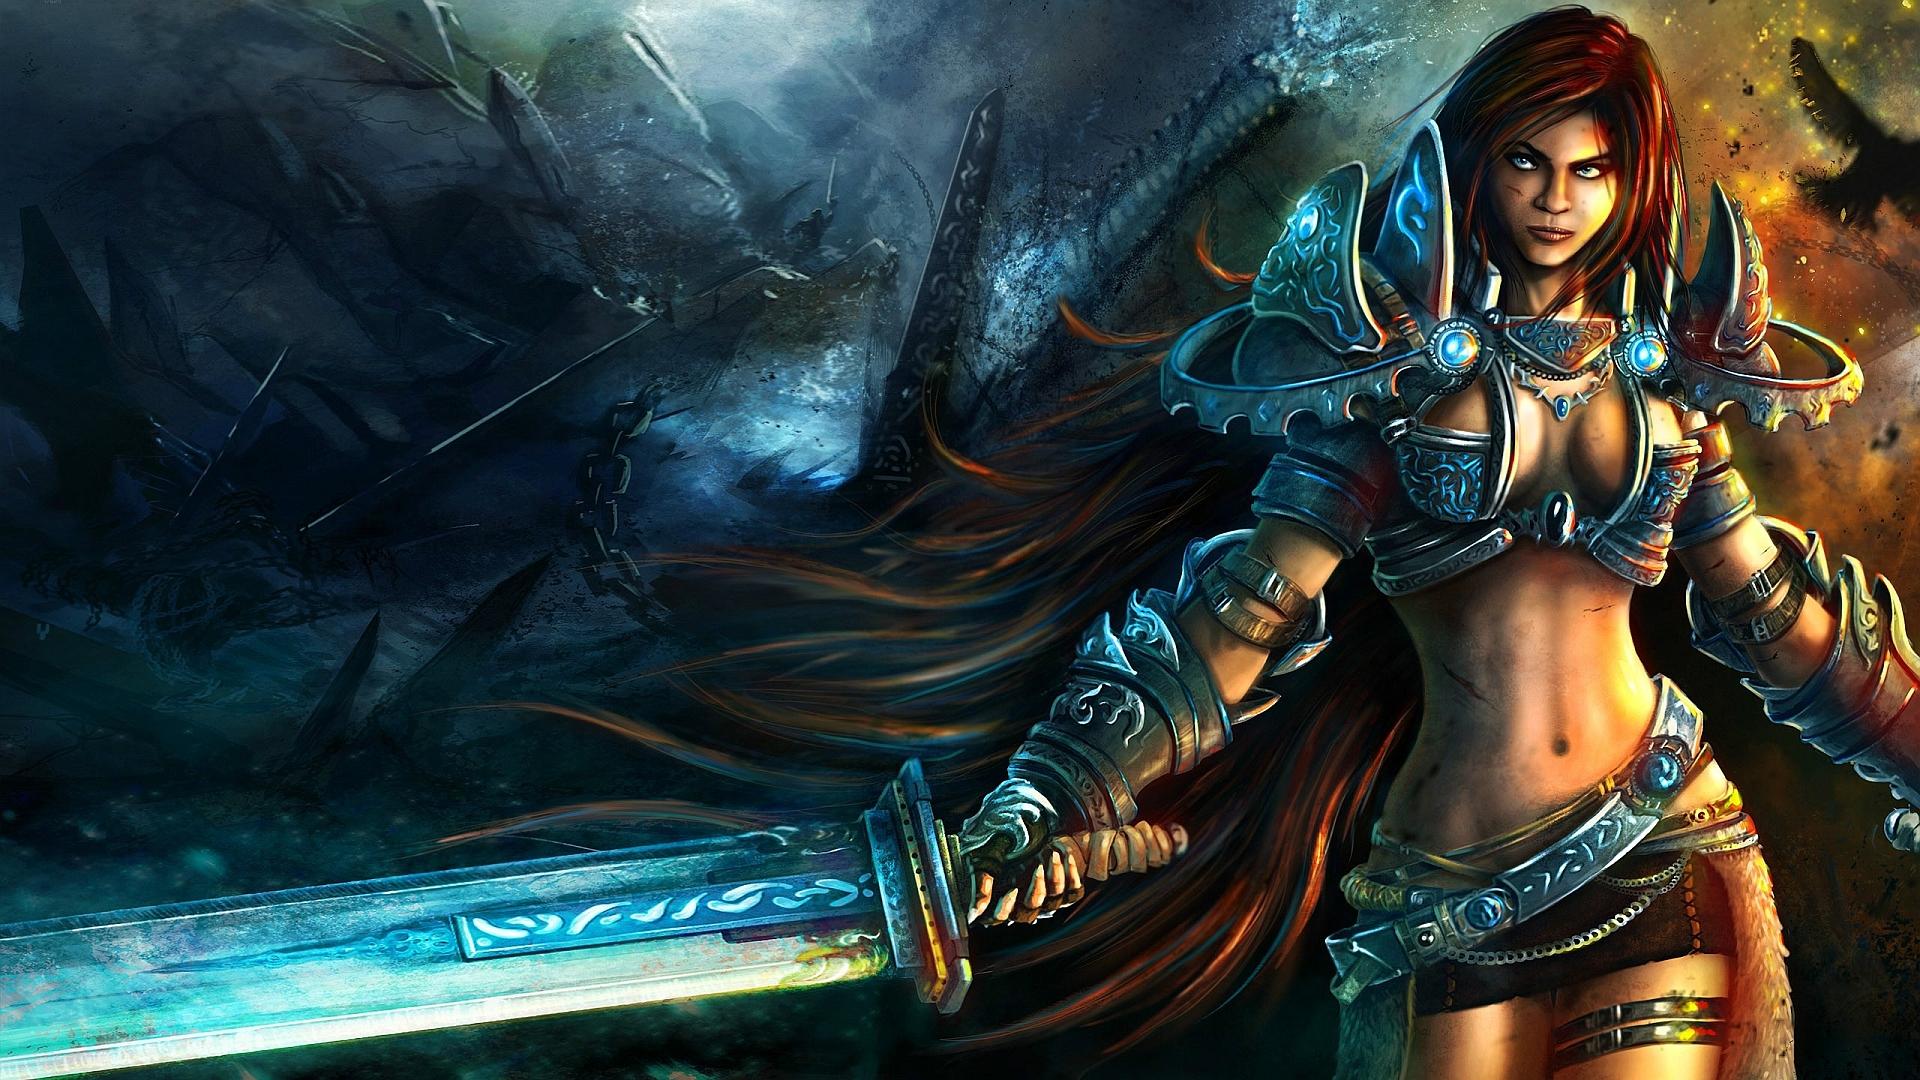 Women warrior art id 88089 art abyss - Fantasy female warrior artwork ...